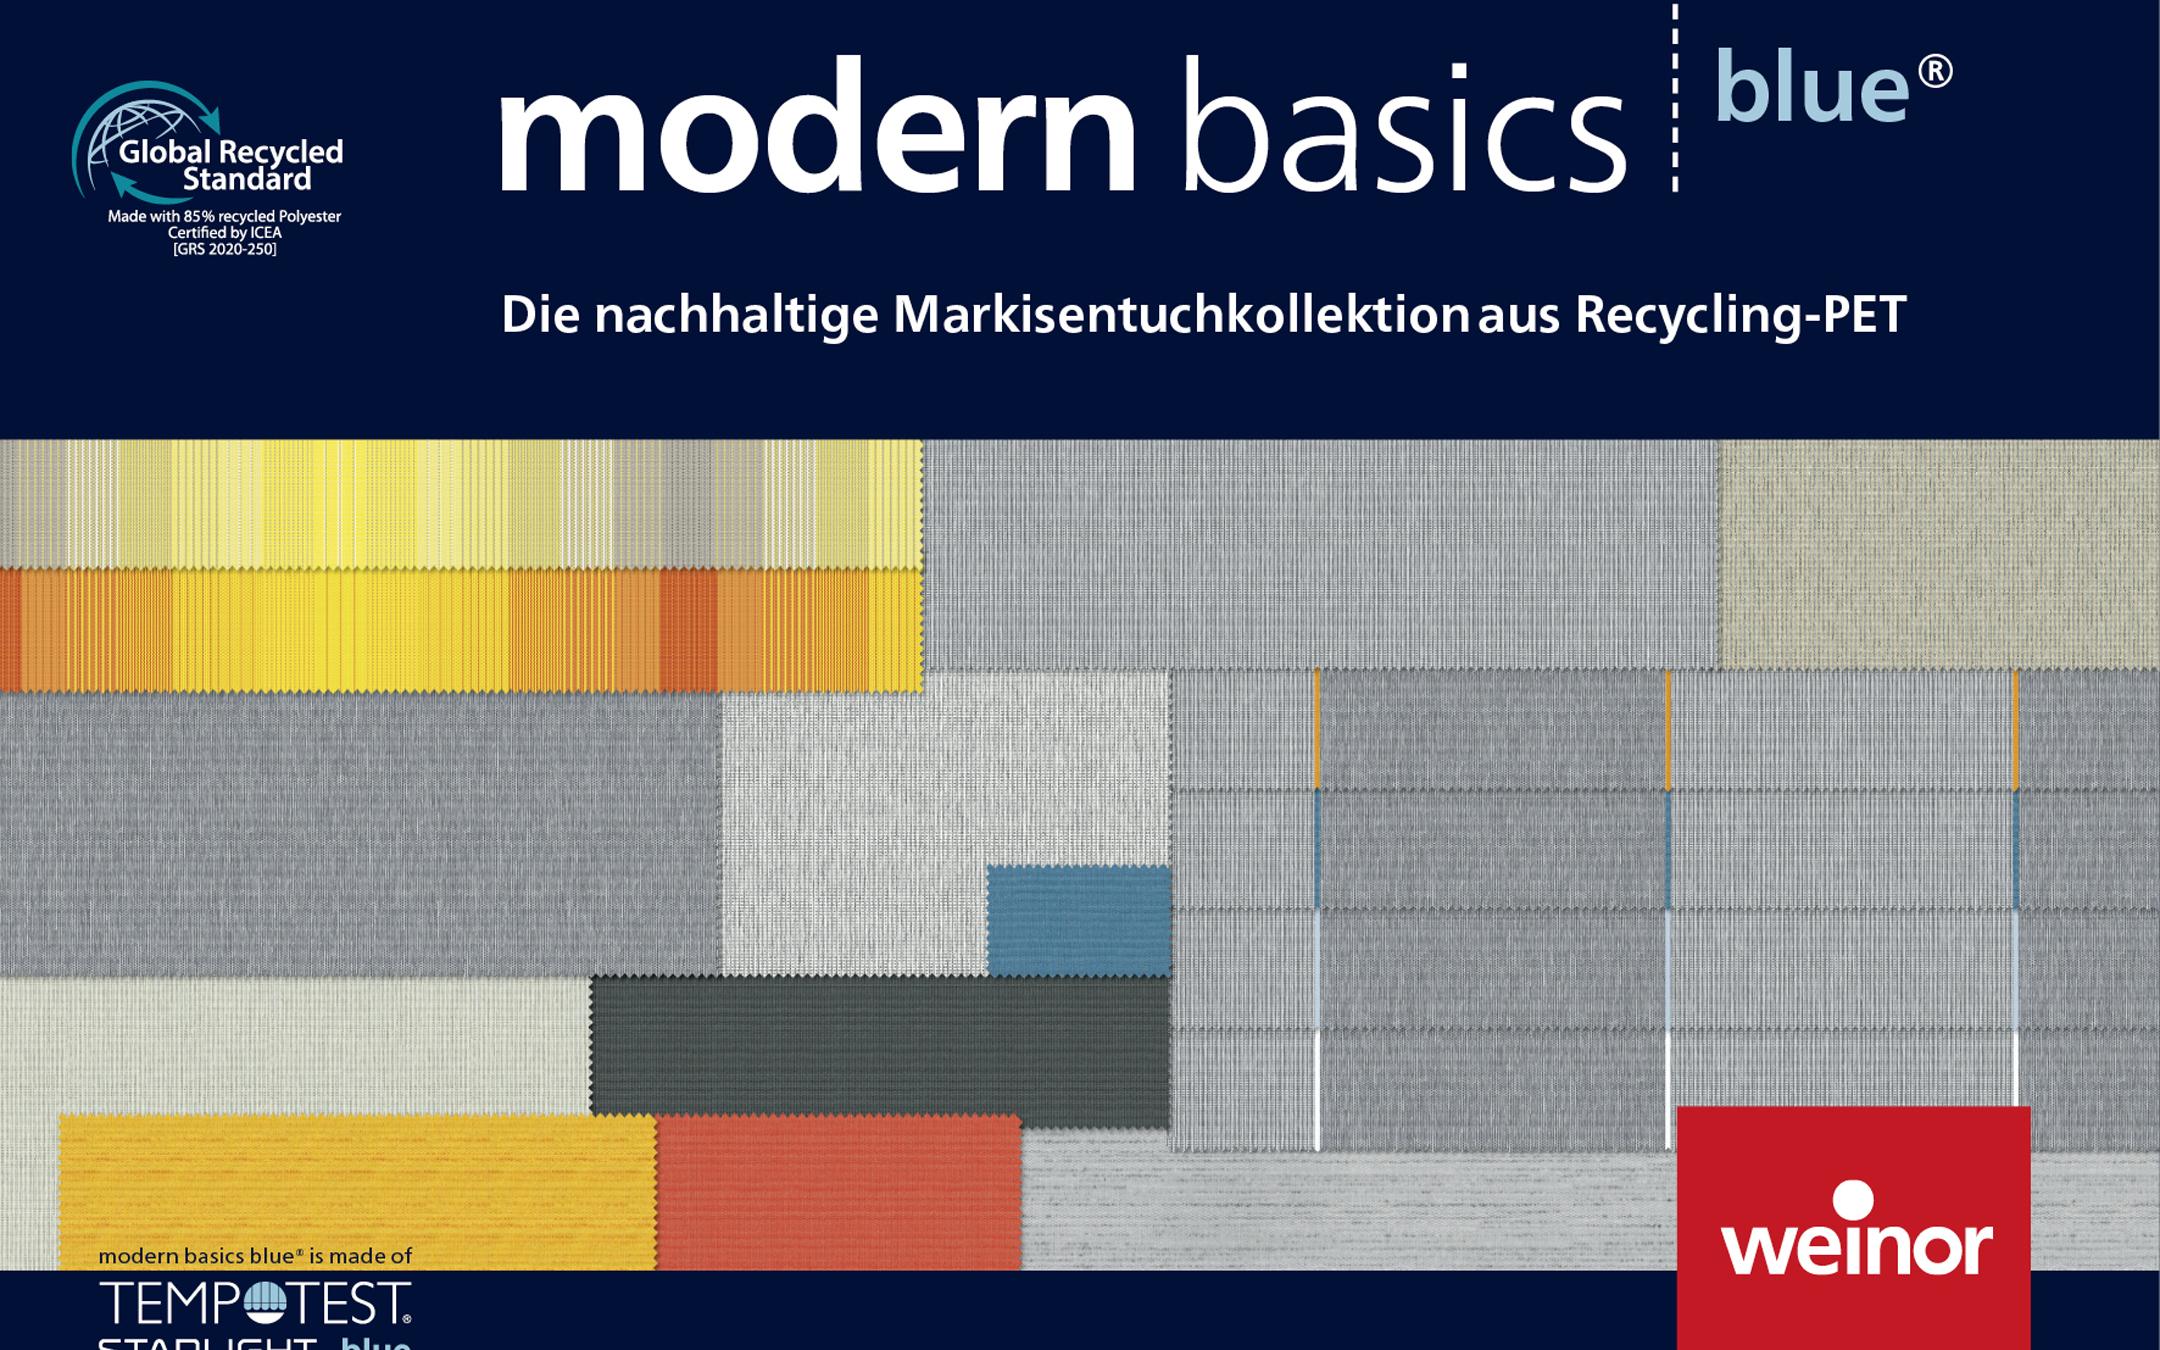 modern basics blue®